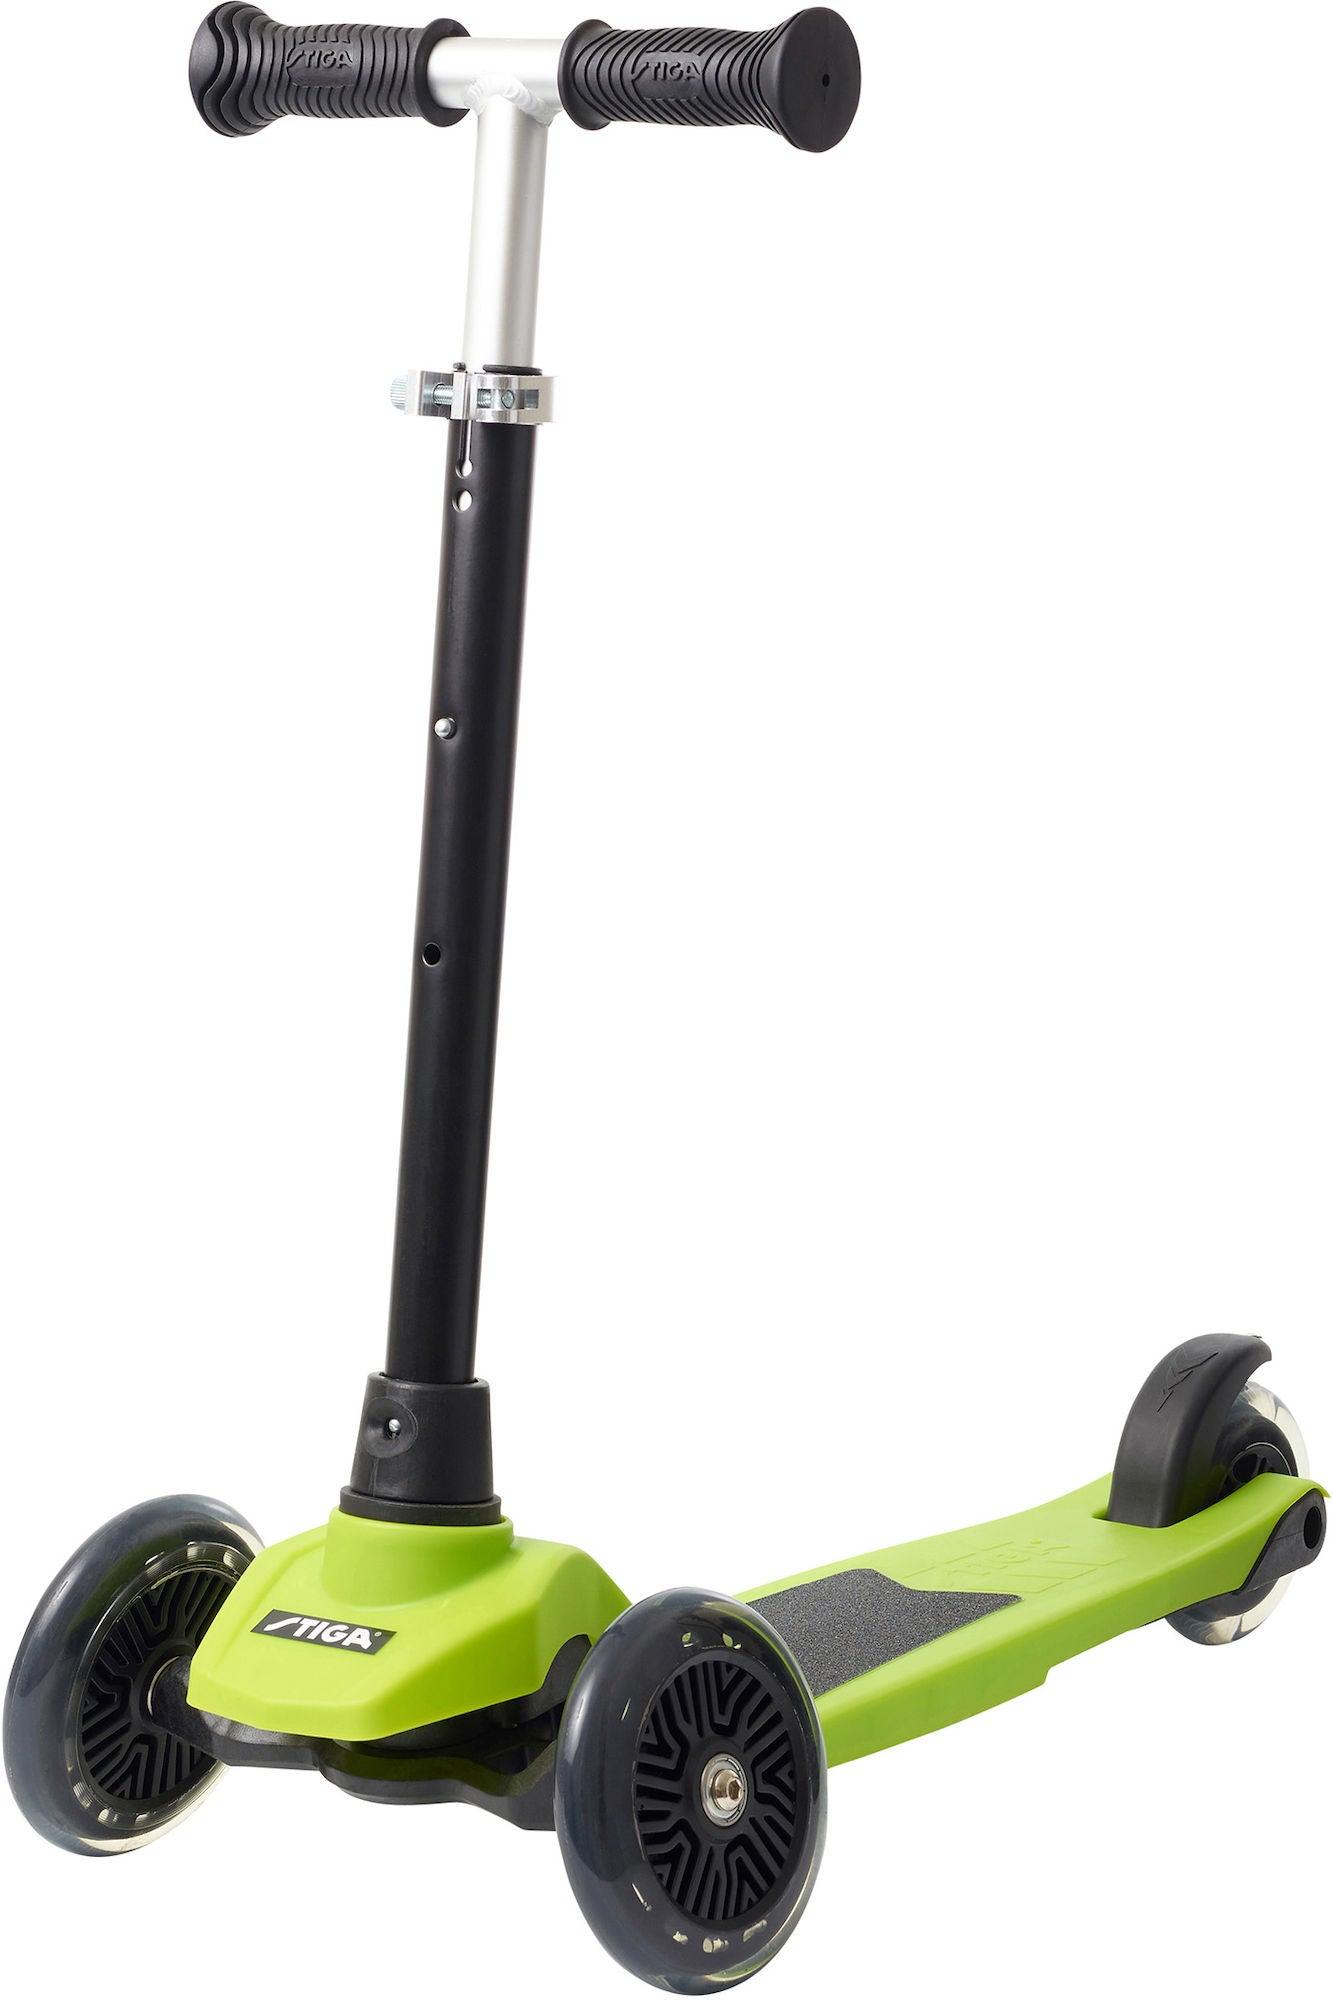 STIGA Sparkcykel Trehjuling Supreme+ 12 tum, Grön